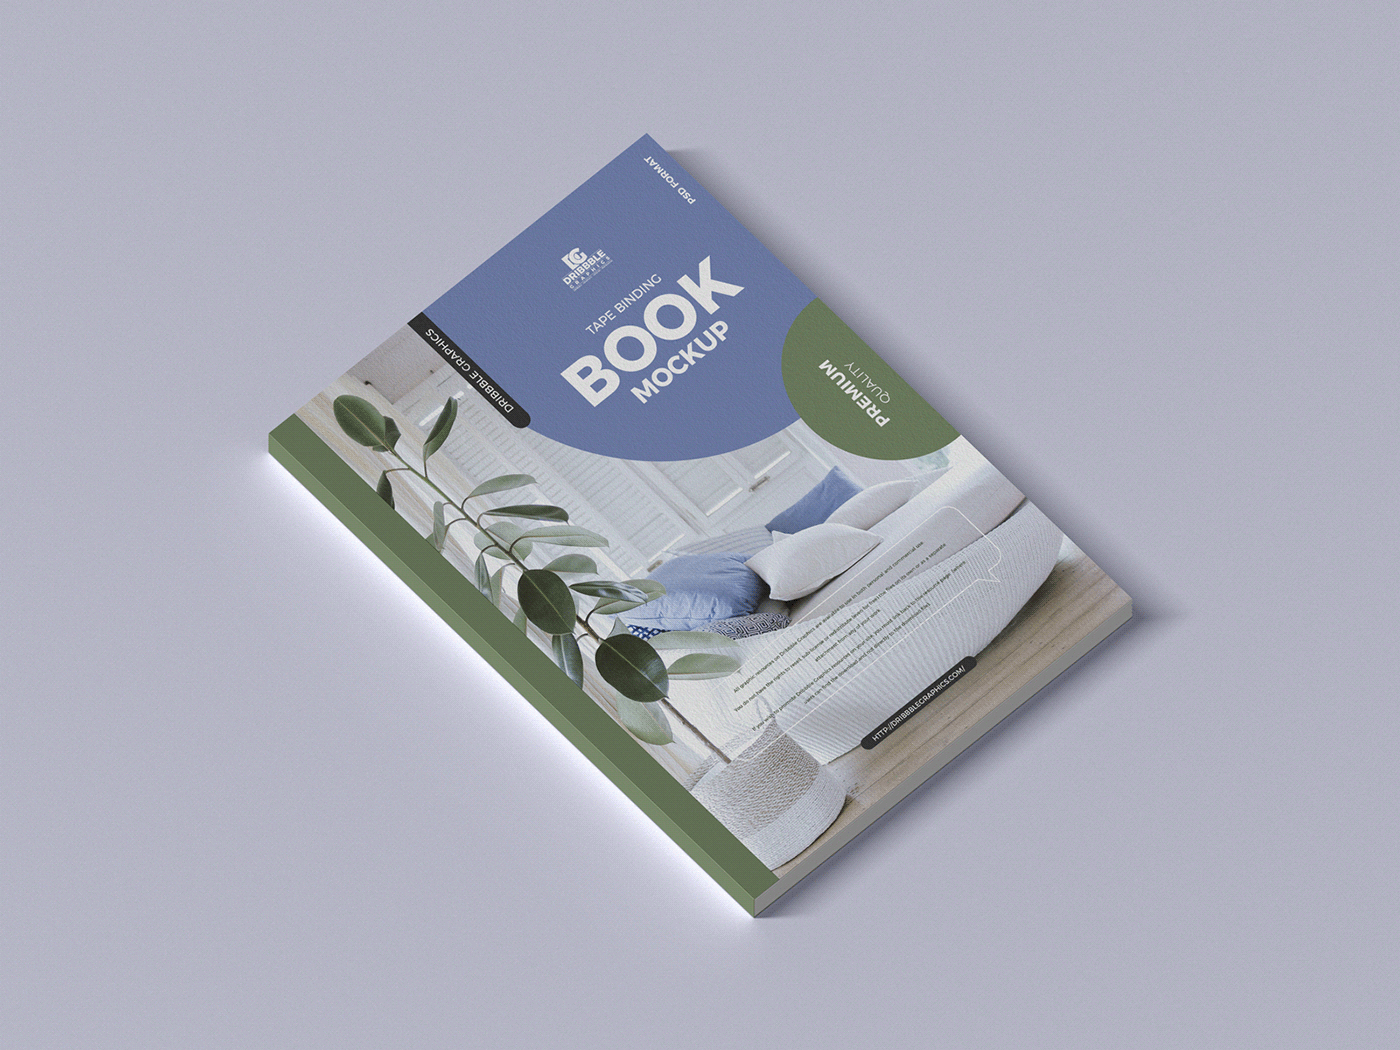 book design book mockup free mockup  freebies mock up Mockup mockup free mockup psd mockups psd